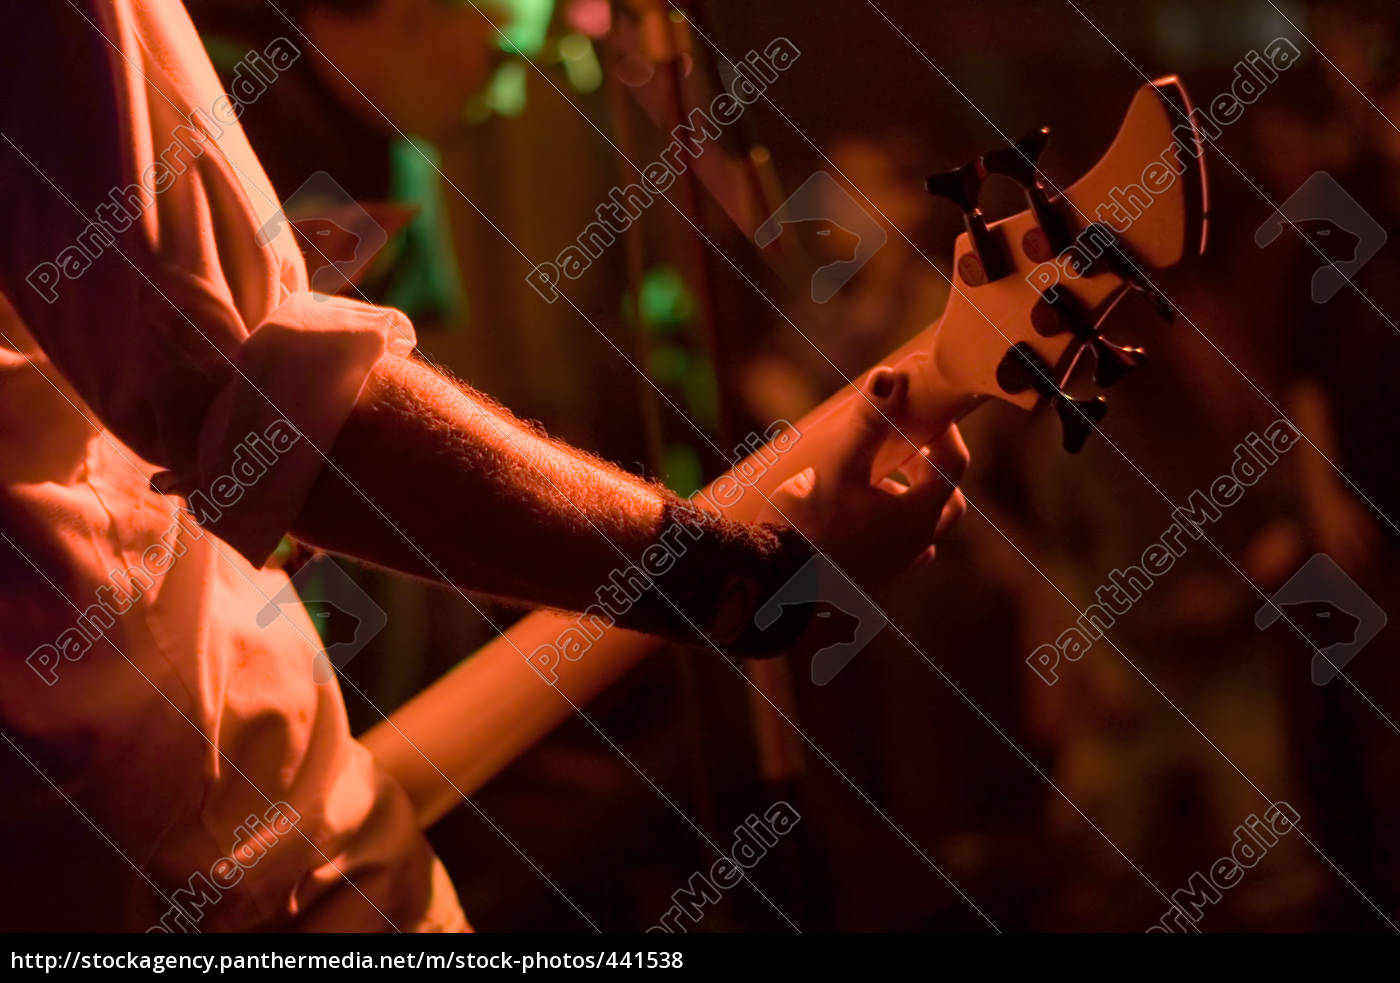 man, with, guitar - 441538